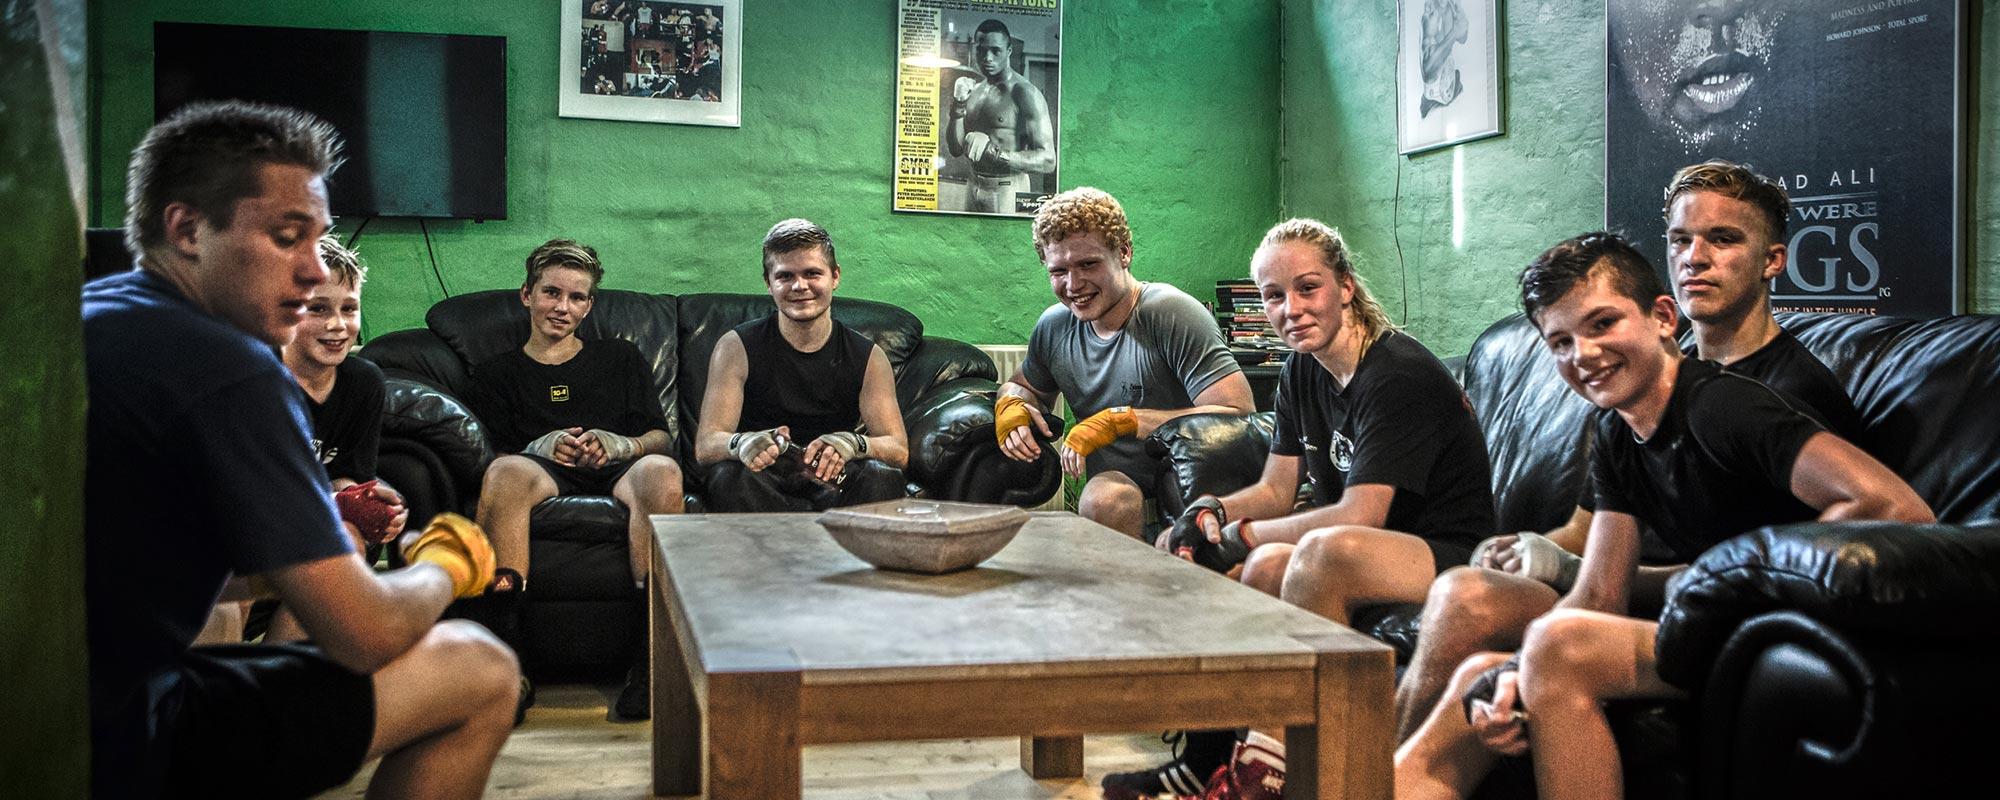 bokseclub-foto1